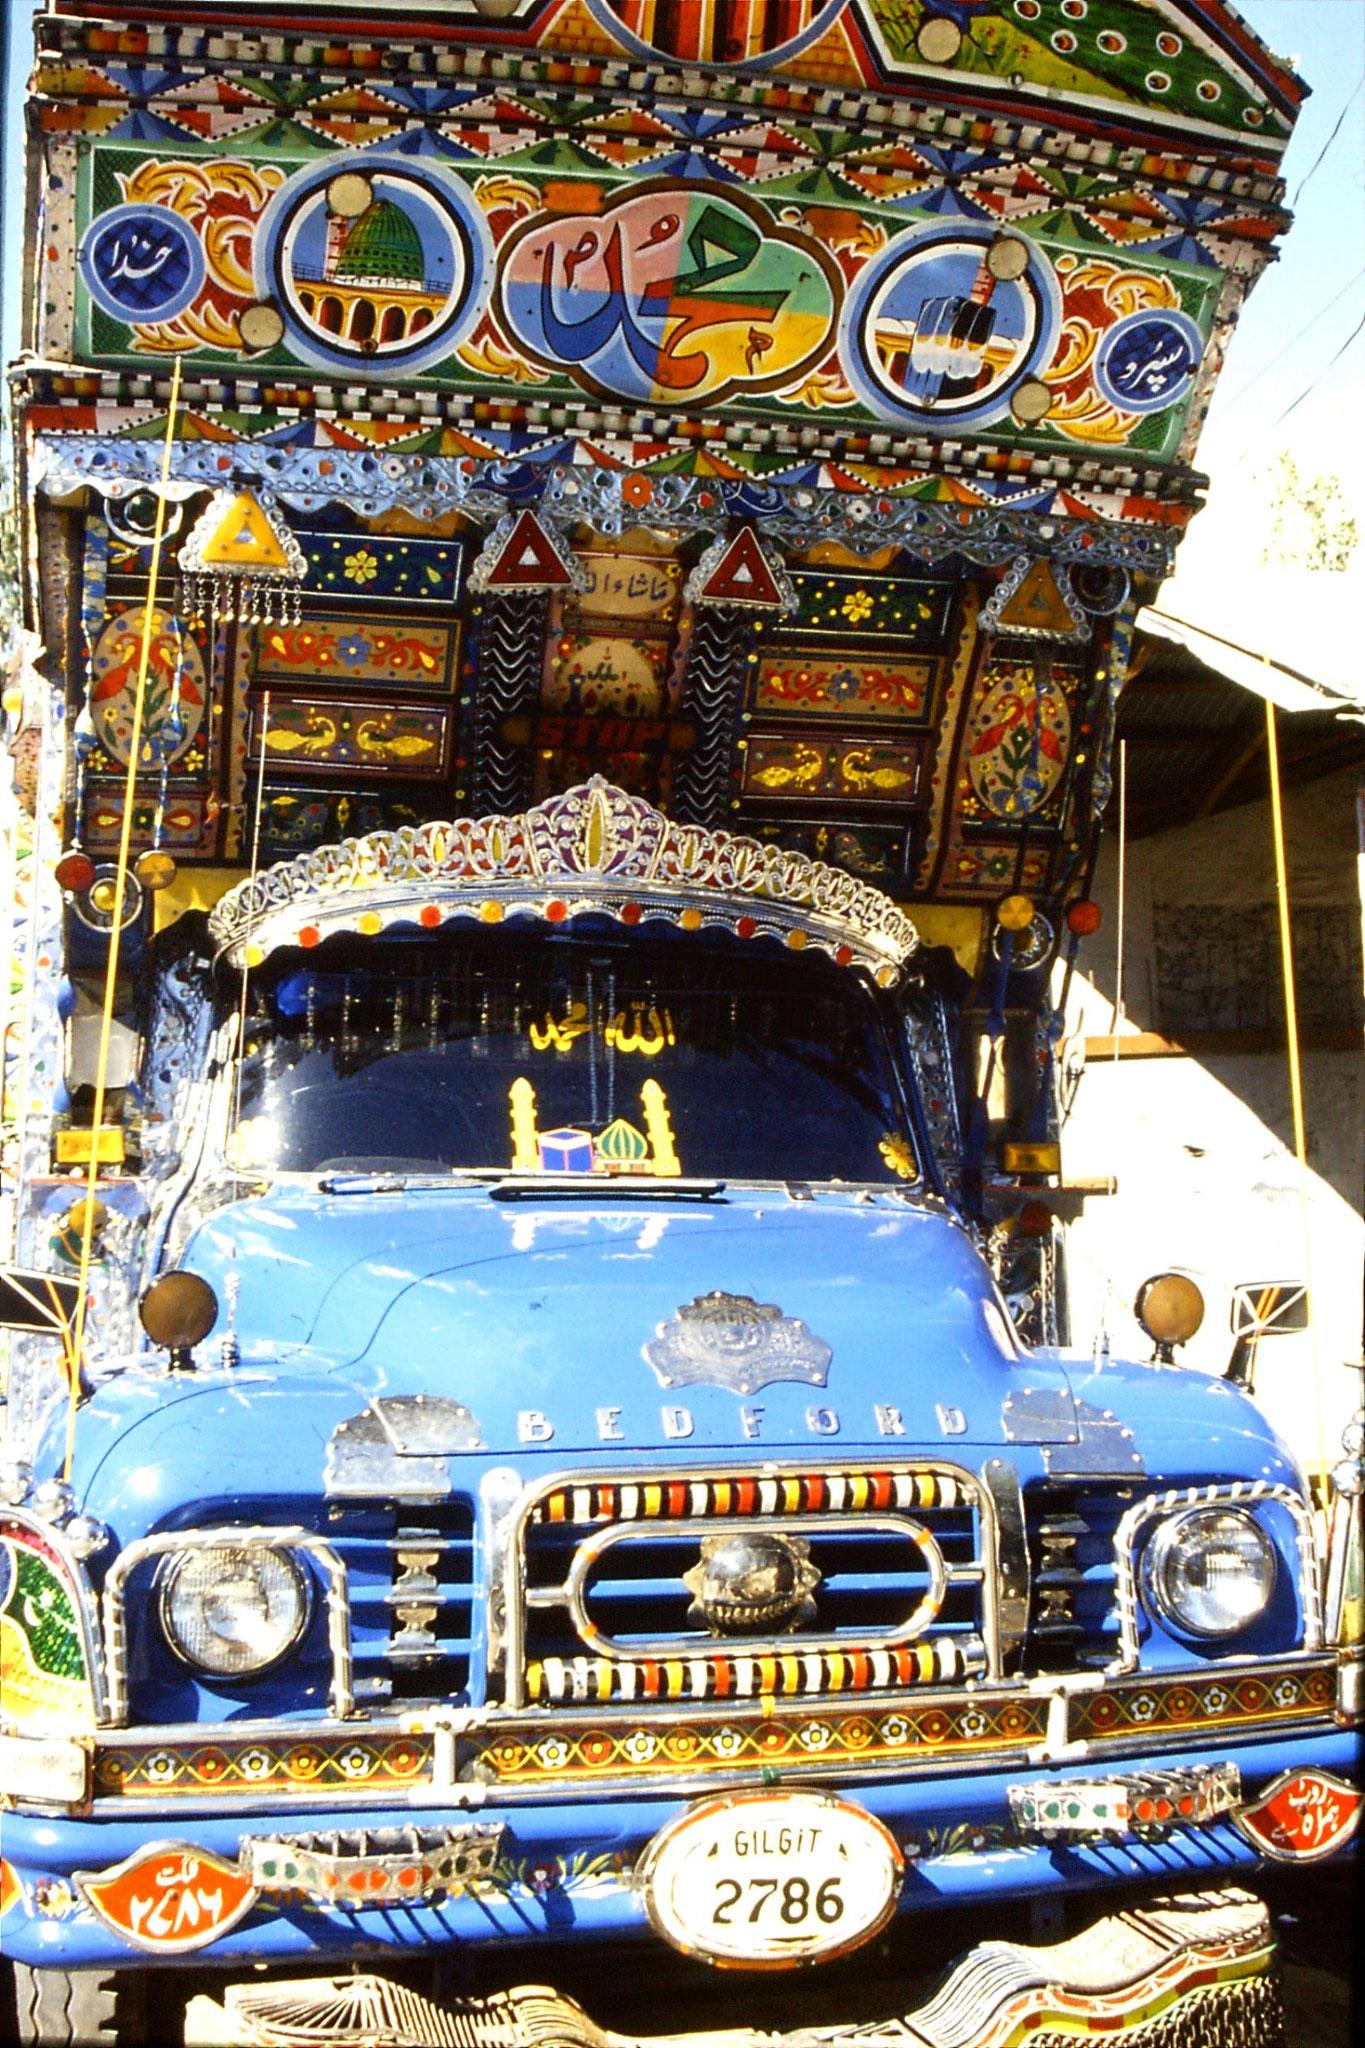 9/10/1989: 2: Gilgit, Bedford lorry